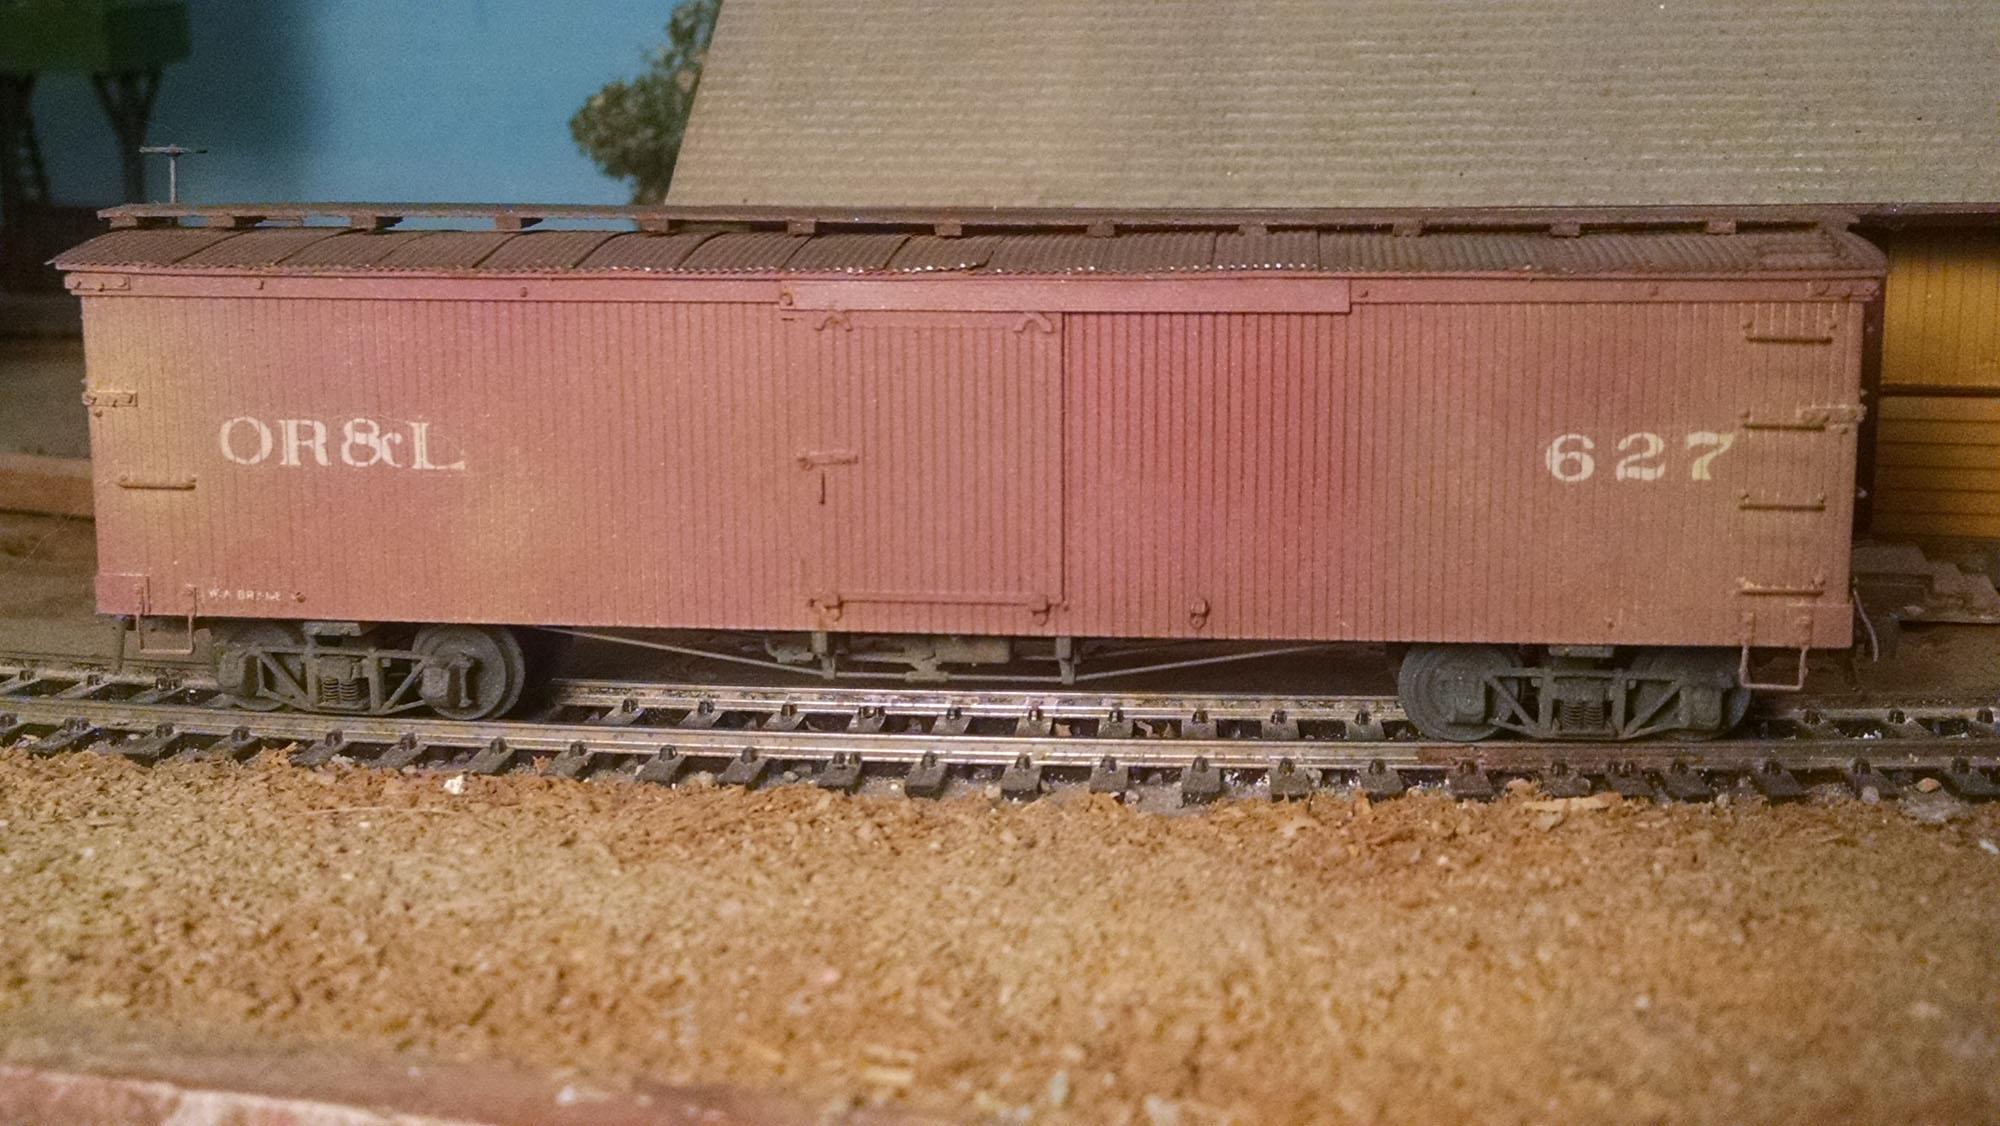 john-leow-or-l-boxcar-1.jpg